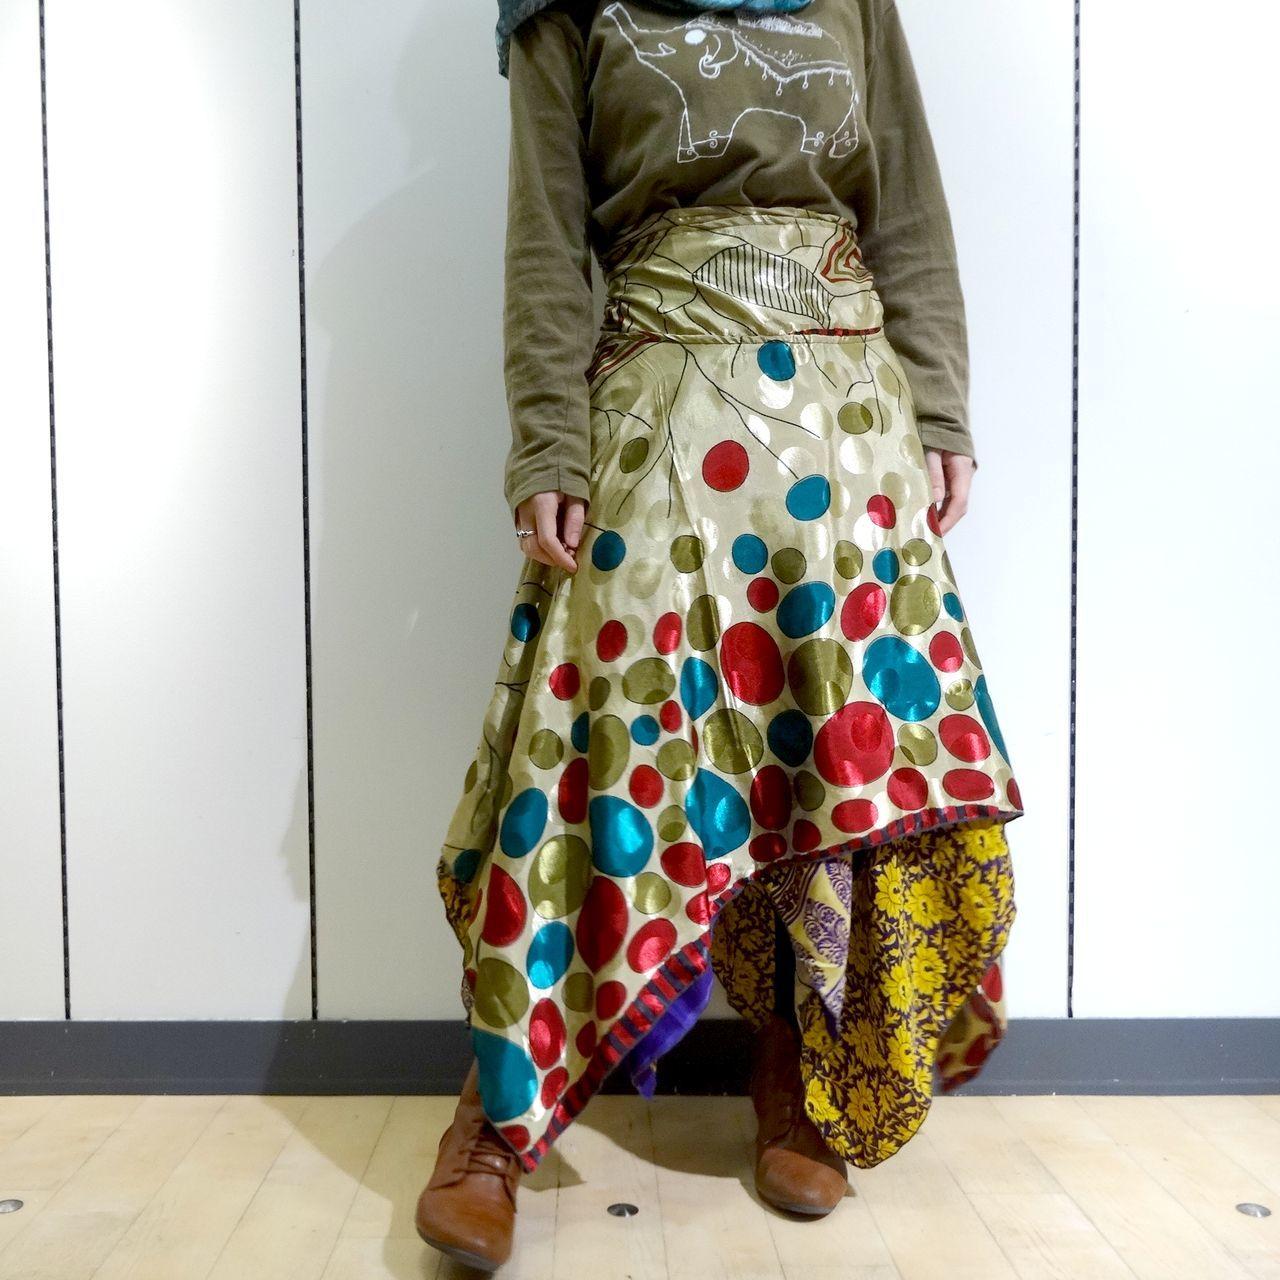 vdsz-010 ビンテージシルクサリーギザスカート「シャボン」